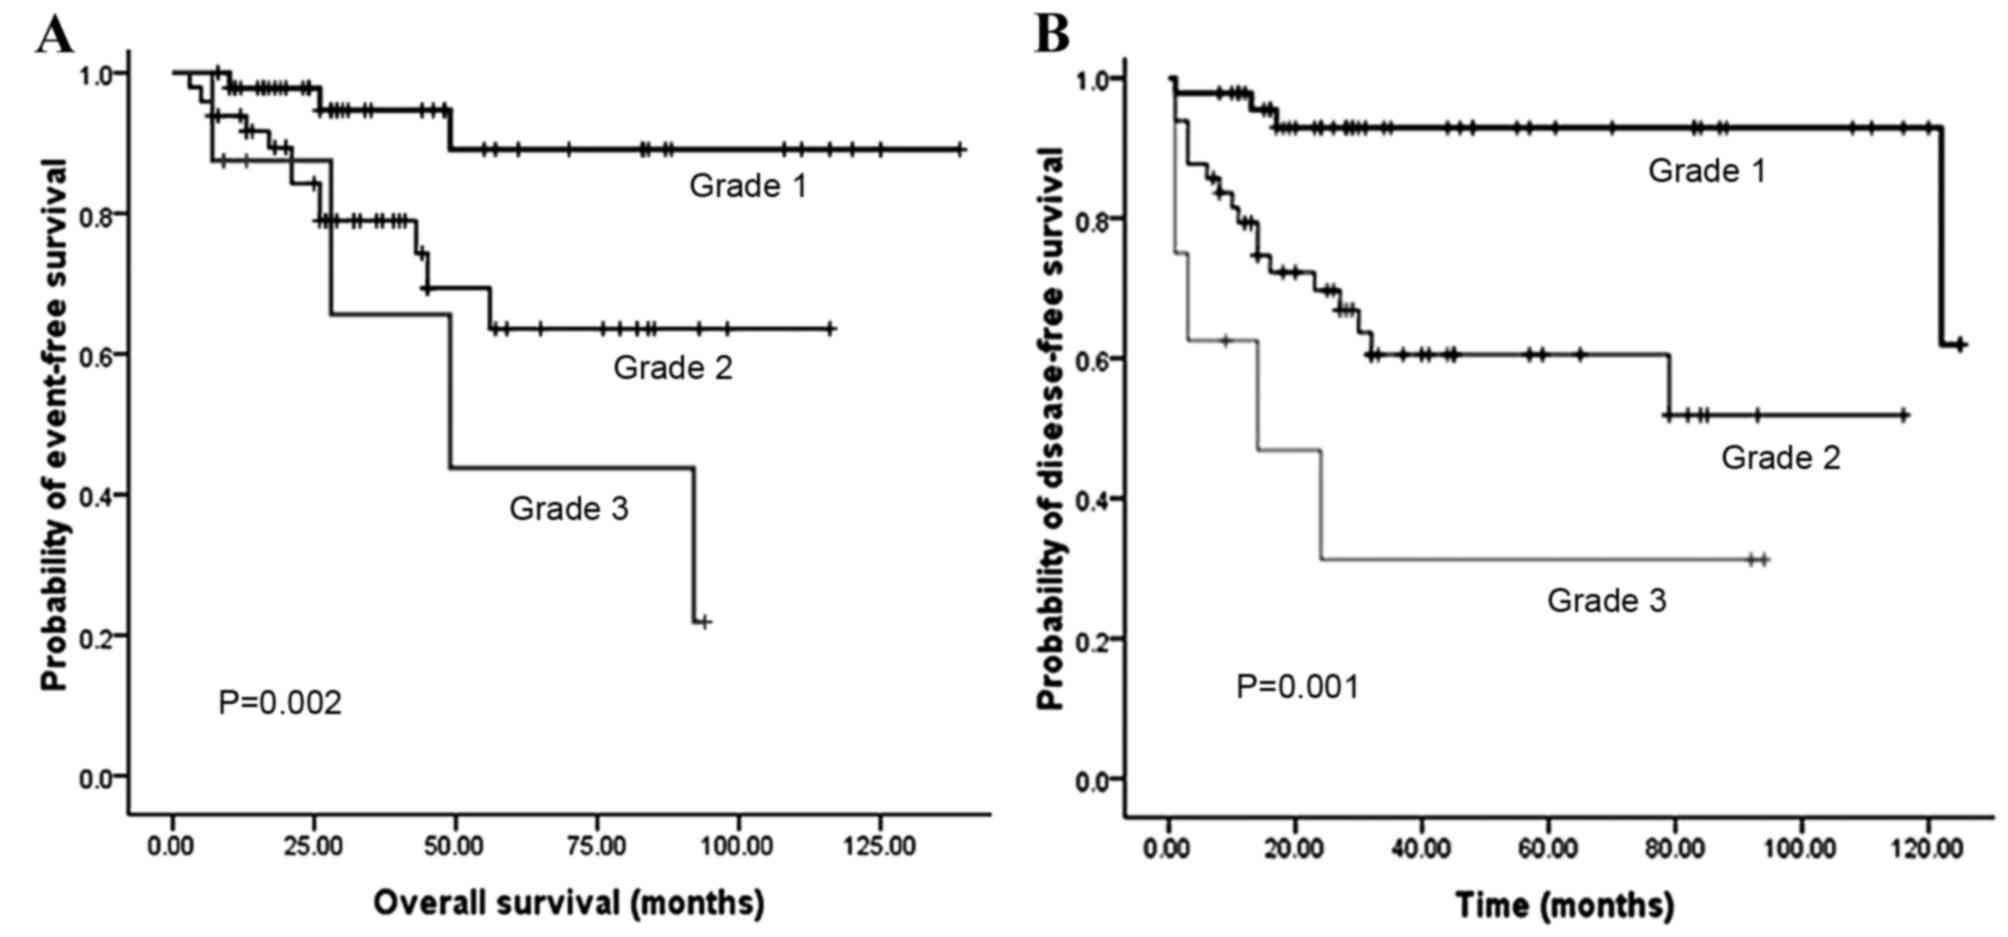 endocrine cancer pancreas prognosis hpv high risk pool